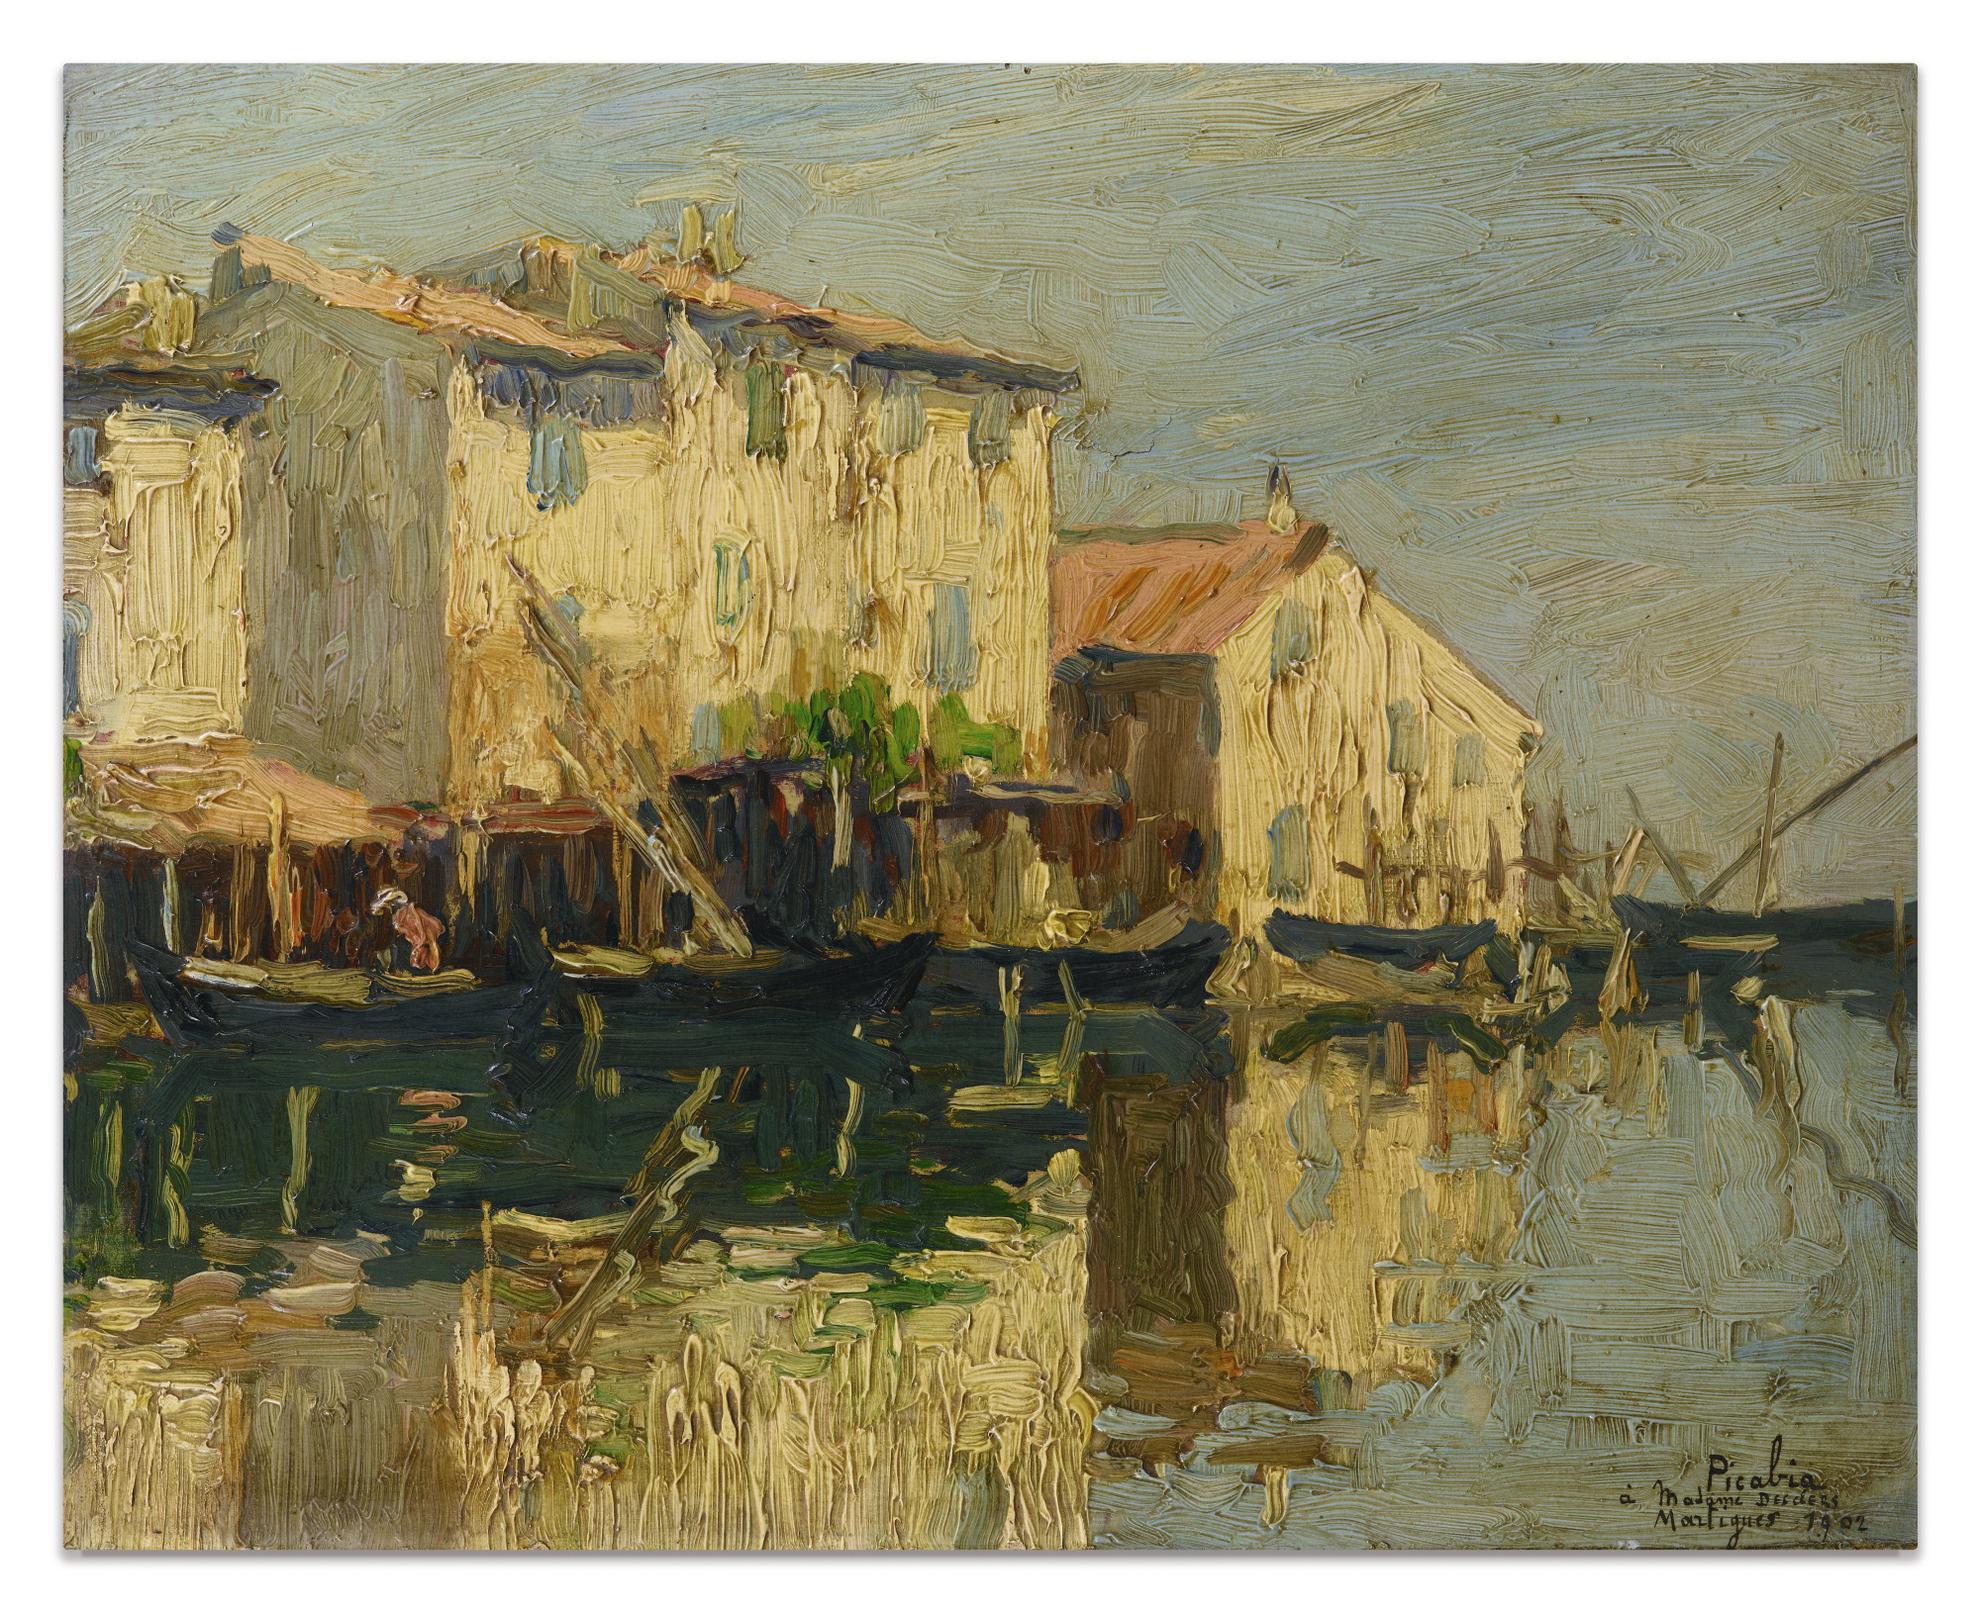 Francis Picabia-Martigues-1902